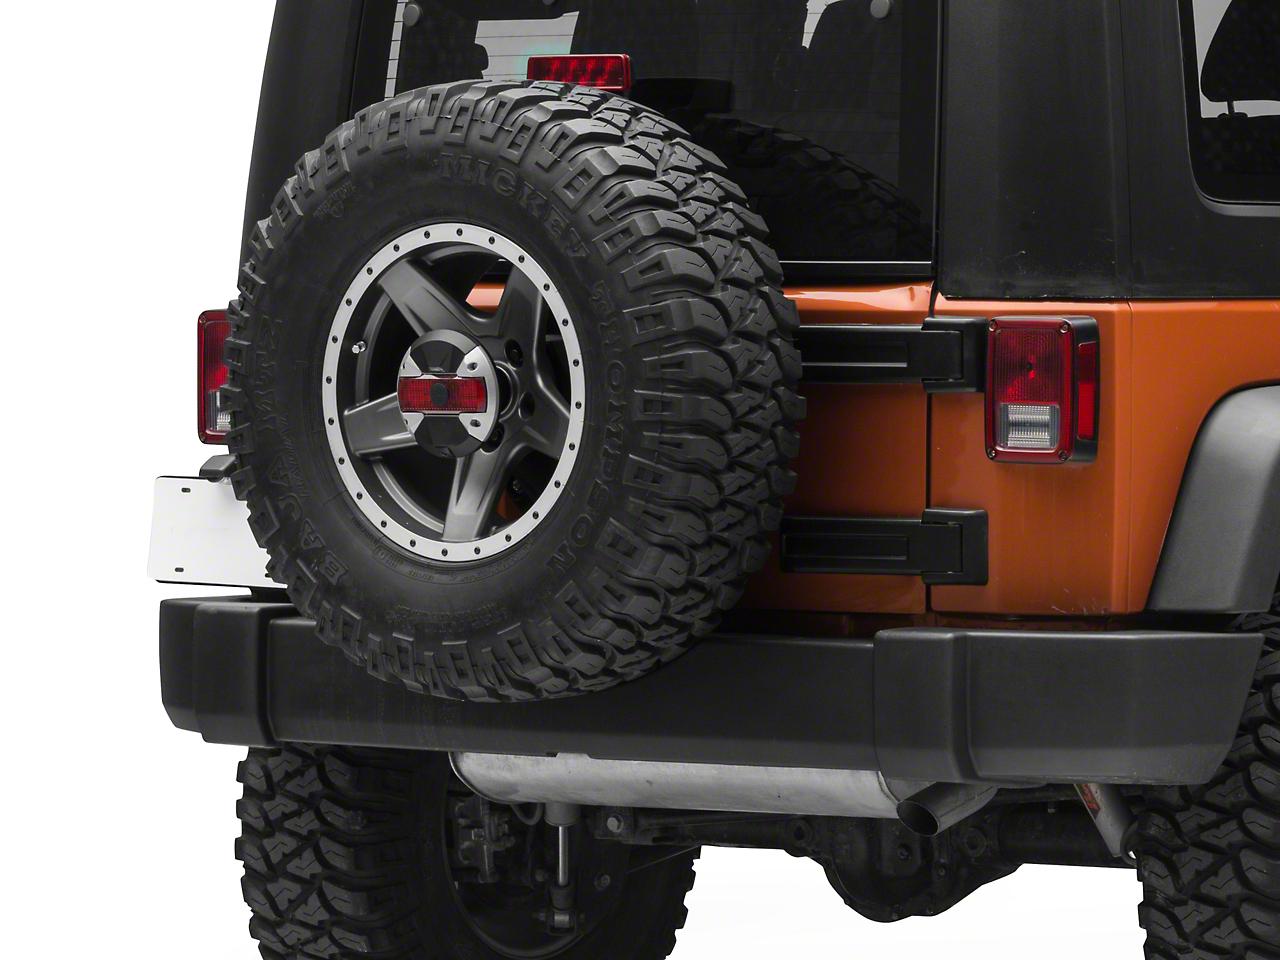 Alpine Spare Tire Rear View Camera & Light System (07-18 Jeep Wrangler JK)